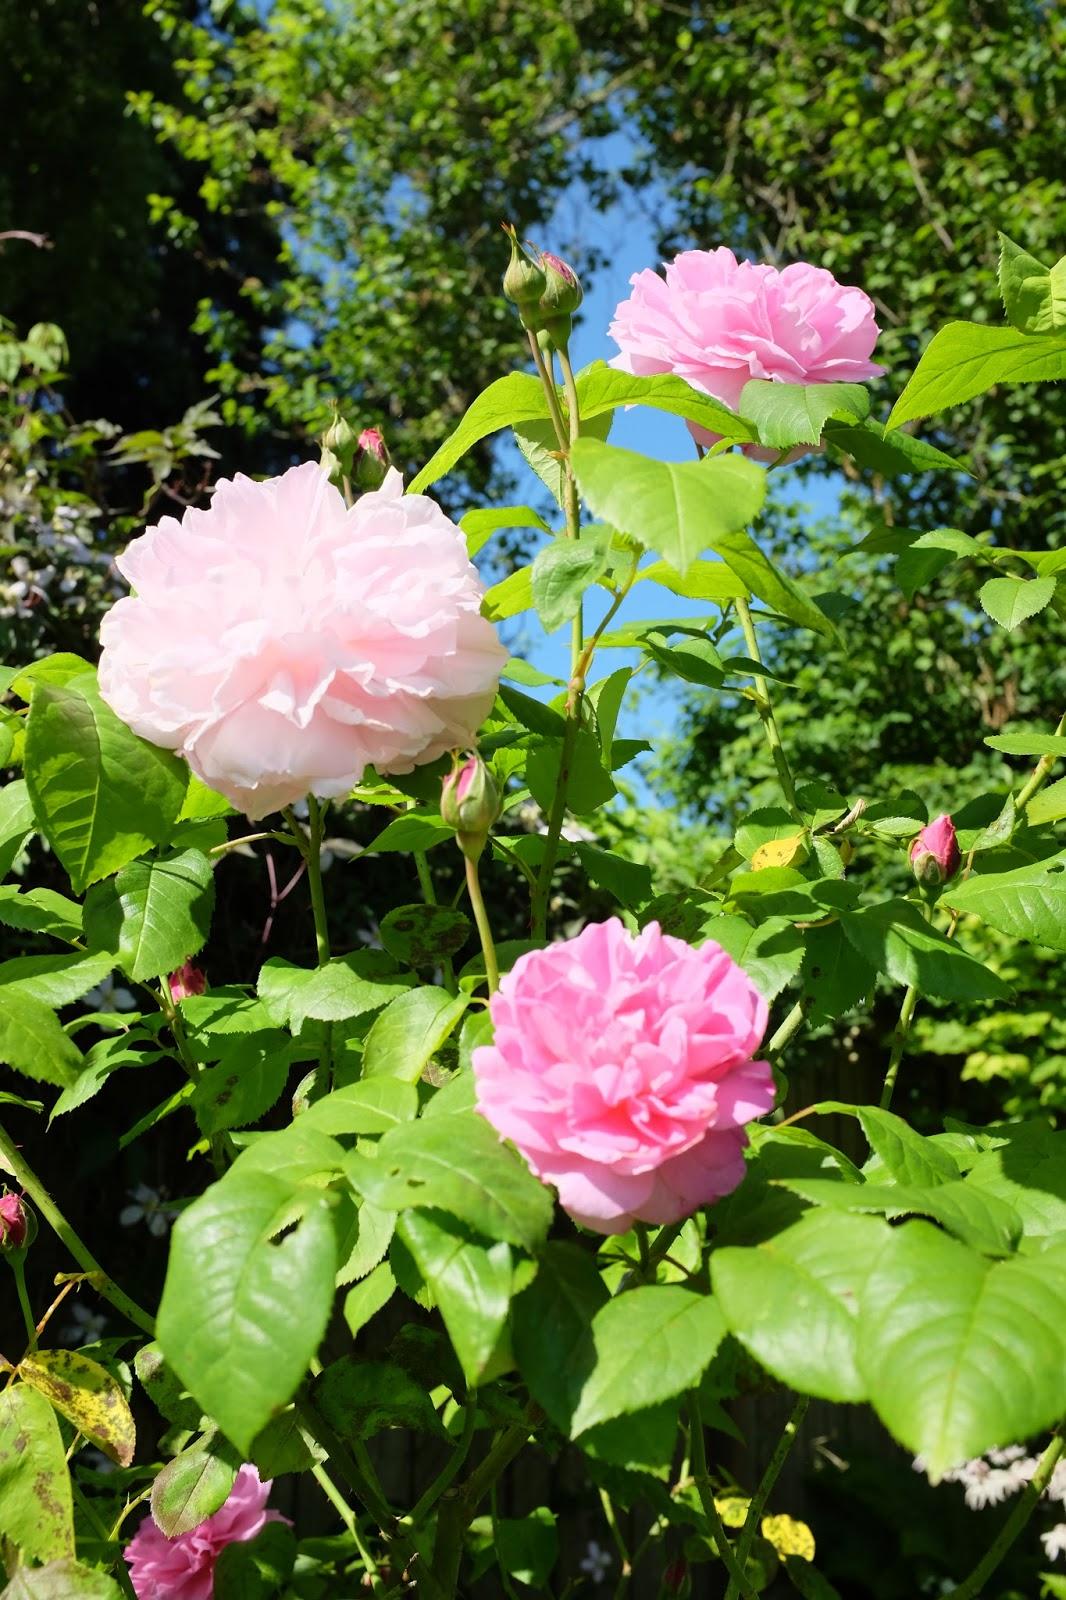 Megan Seagren 39 S Journal How To Plan A Garden